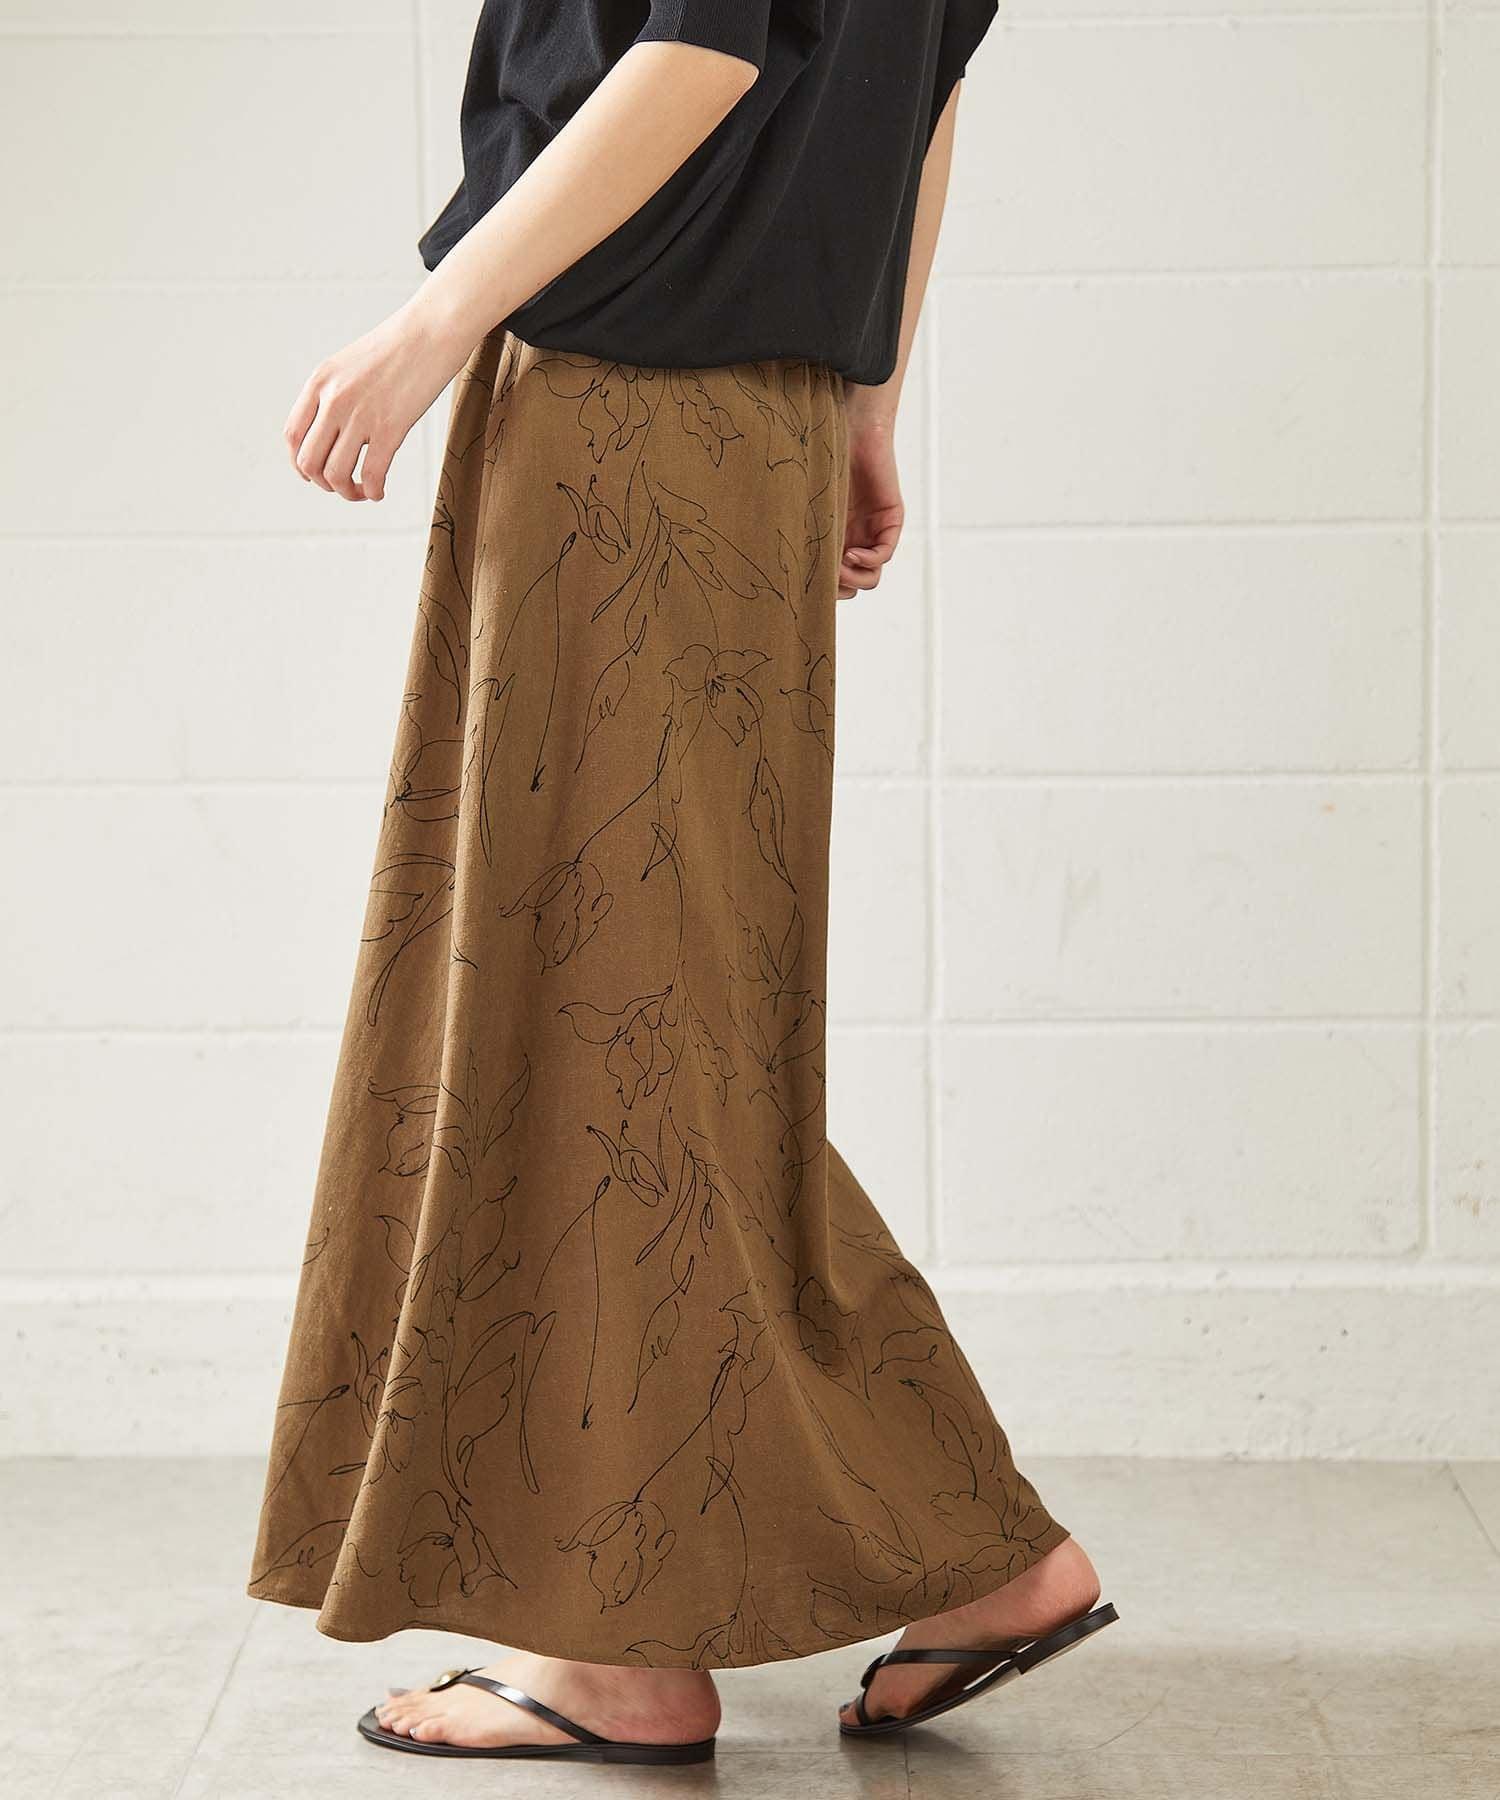 OUVRAGE CLASSE(ウヴラージュクラス) レーヨン麻キャンバスプリントスカート